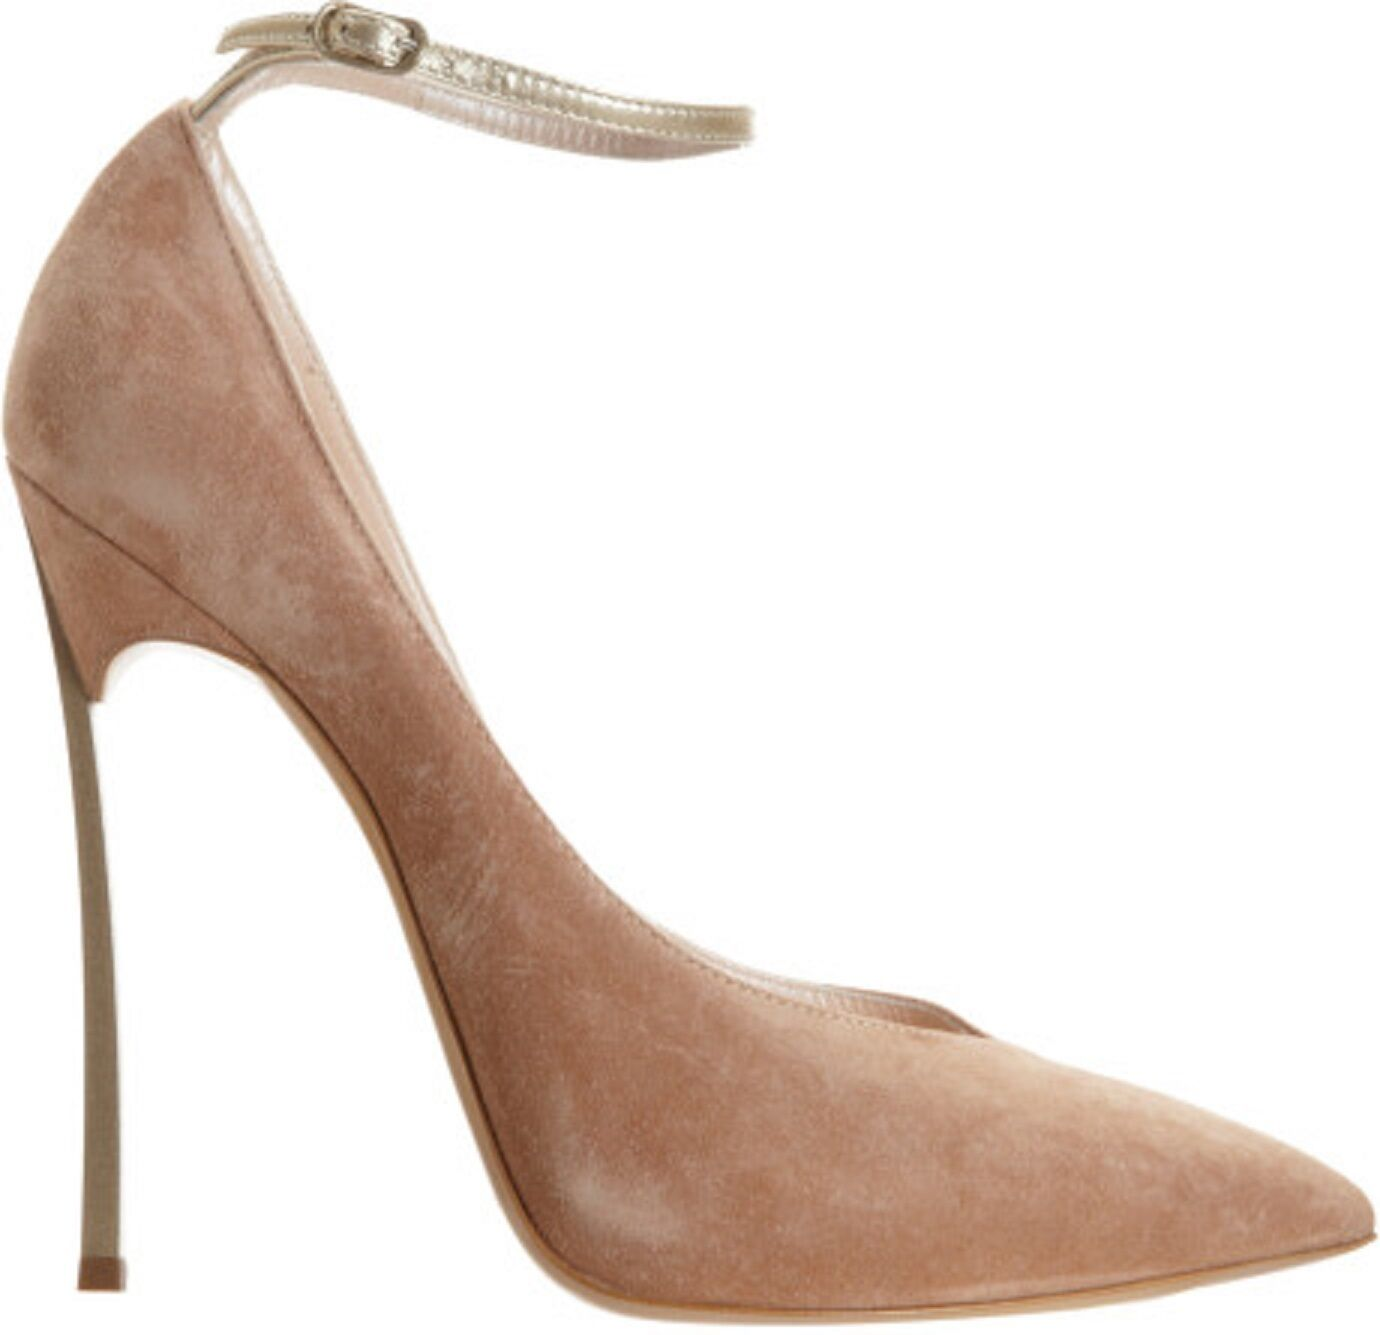 820 CASADEI 10 (9.5) Metal Blade Spike Heel Beige Tan Suede shoes Ankle Strap